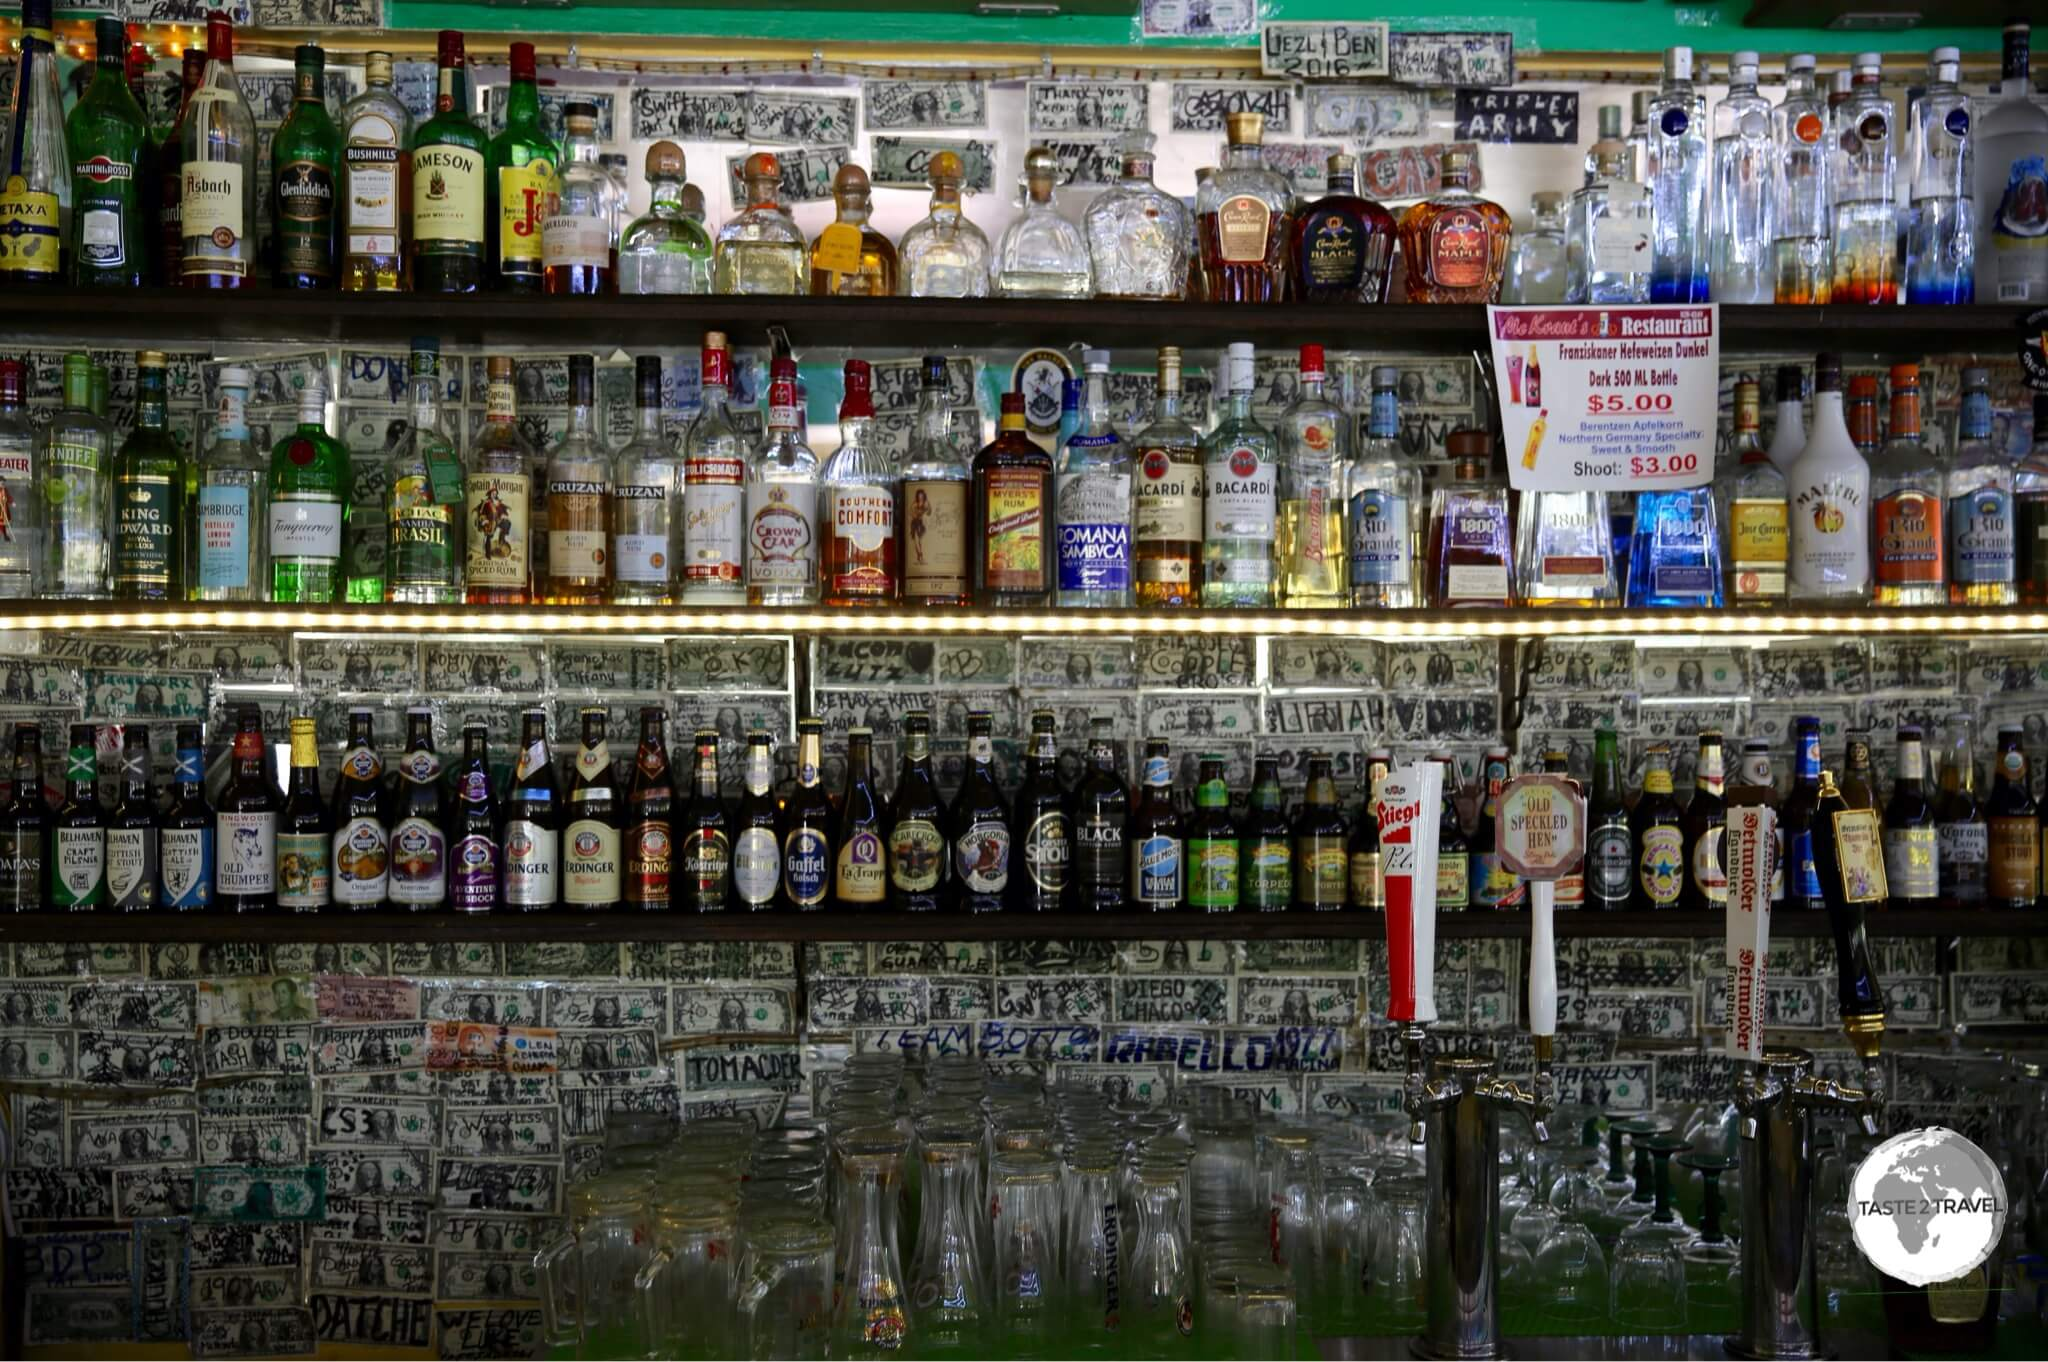 The well stocked bar at McKraut's German restaurant.